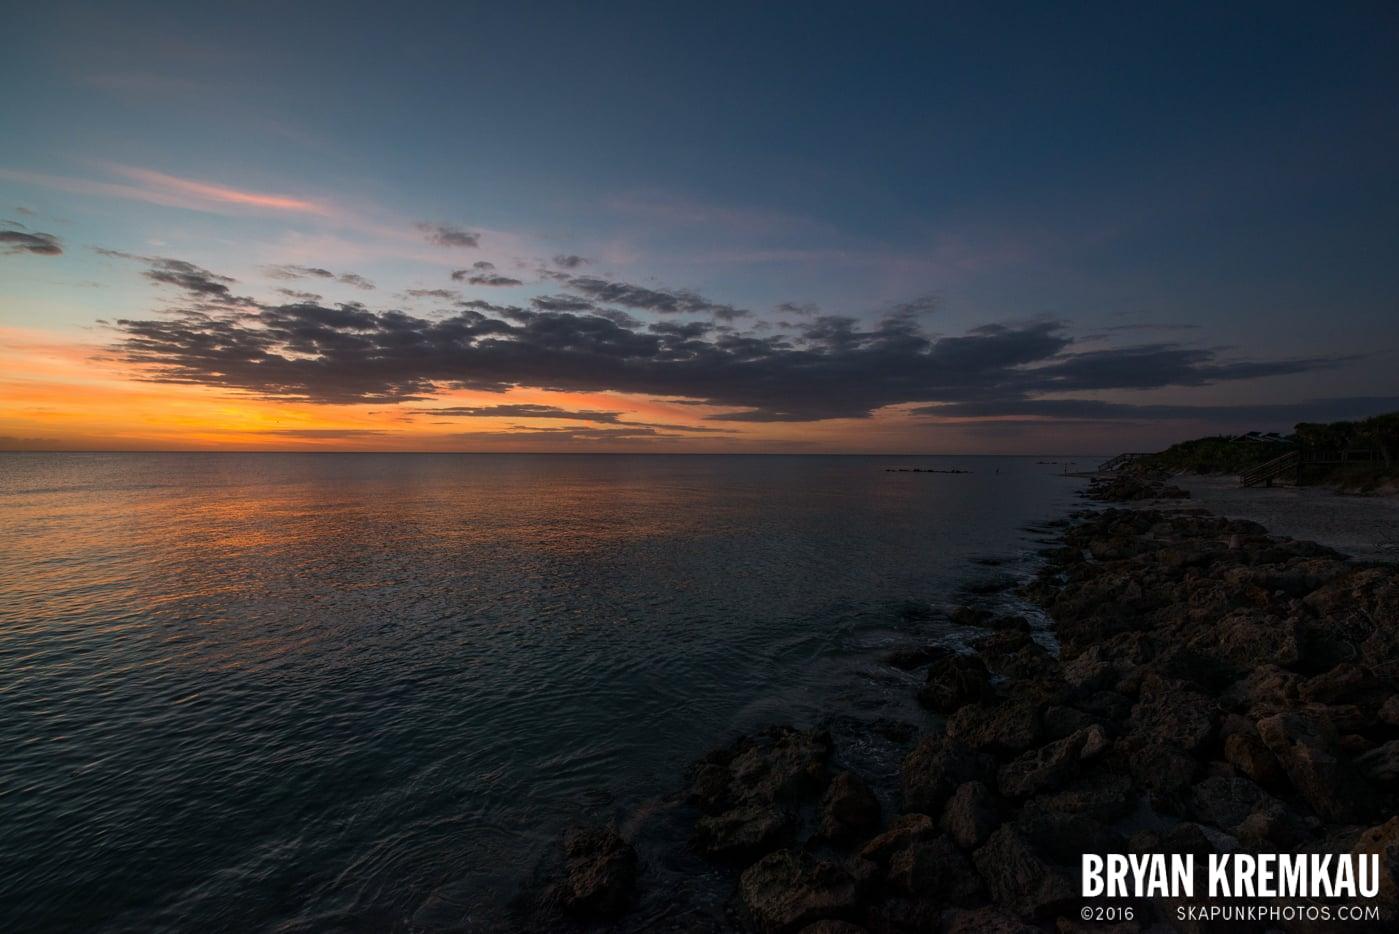 Sunsets, Astrophotography & Birds @ Venice, Florida - 10.25.14 - 11.5.14 (61)